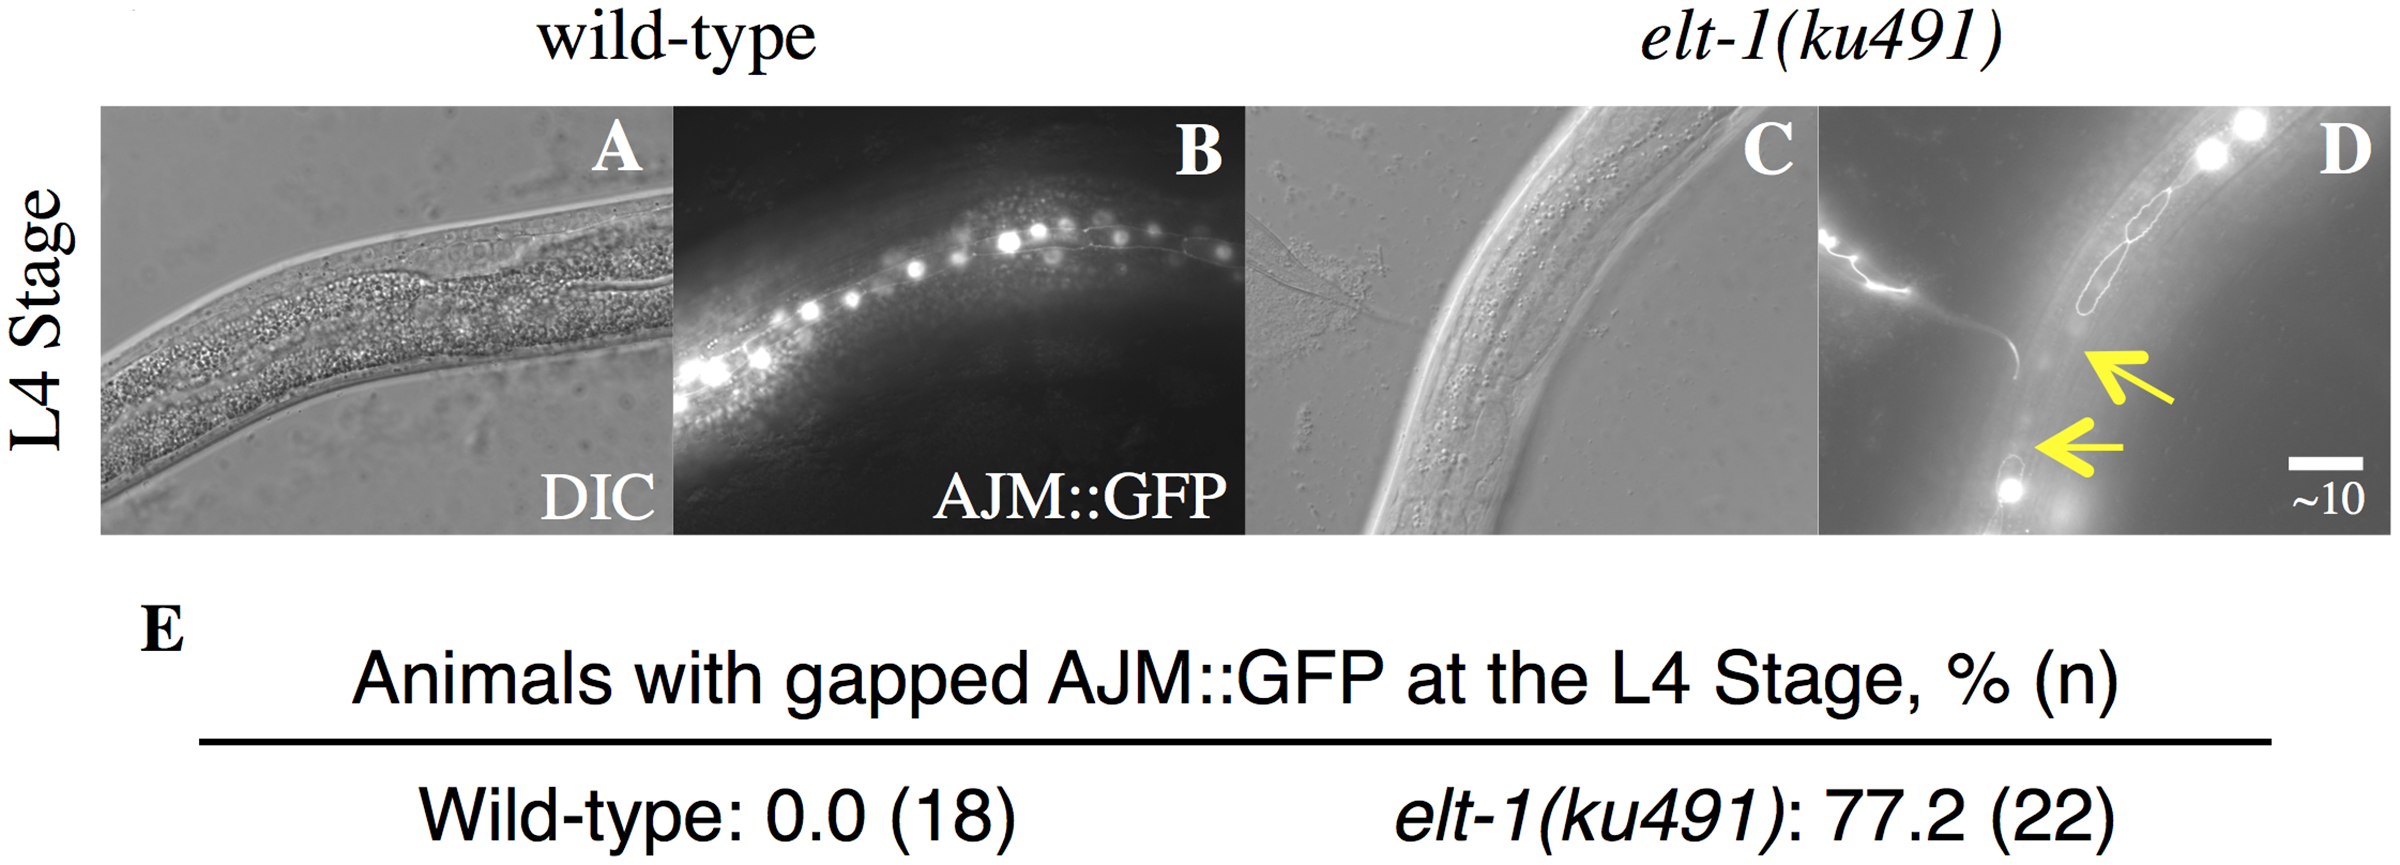 <i>elt-1/(ku491)</i> mutant animals have defective adult alae formation.